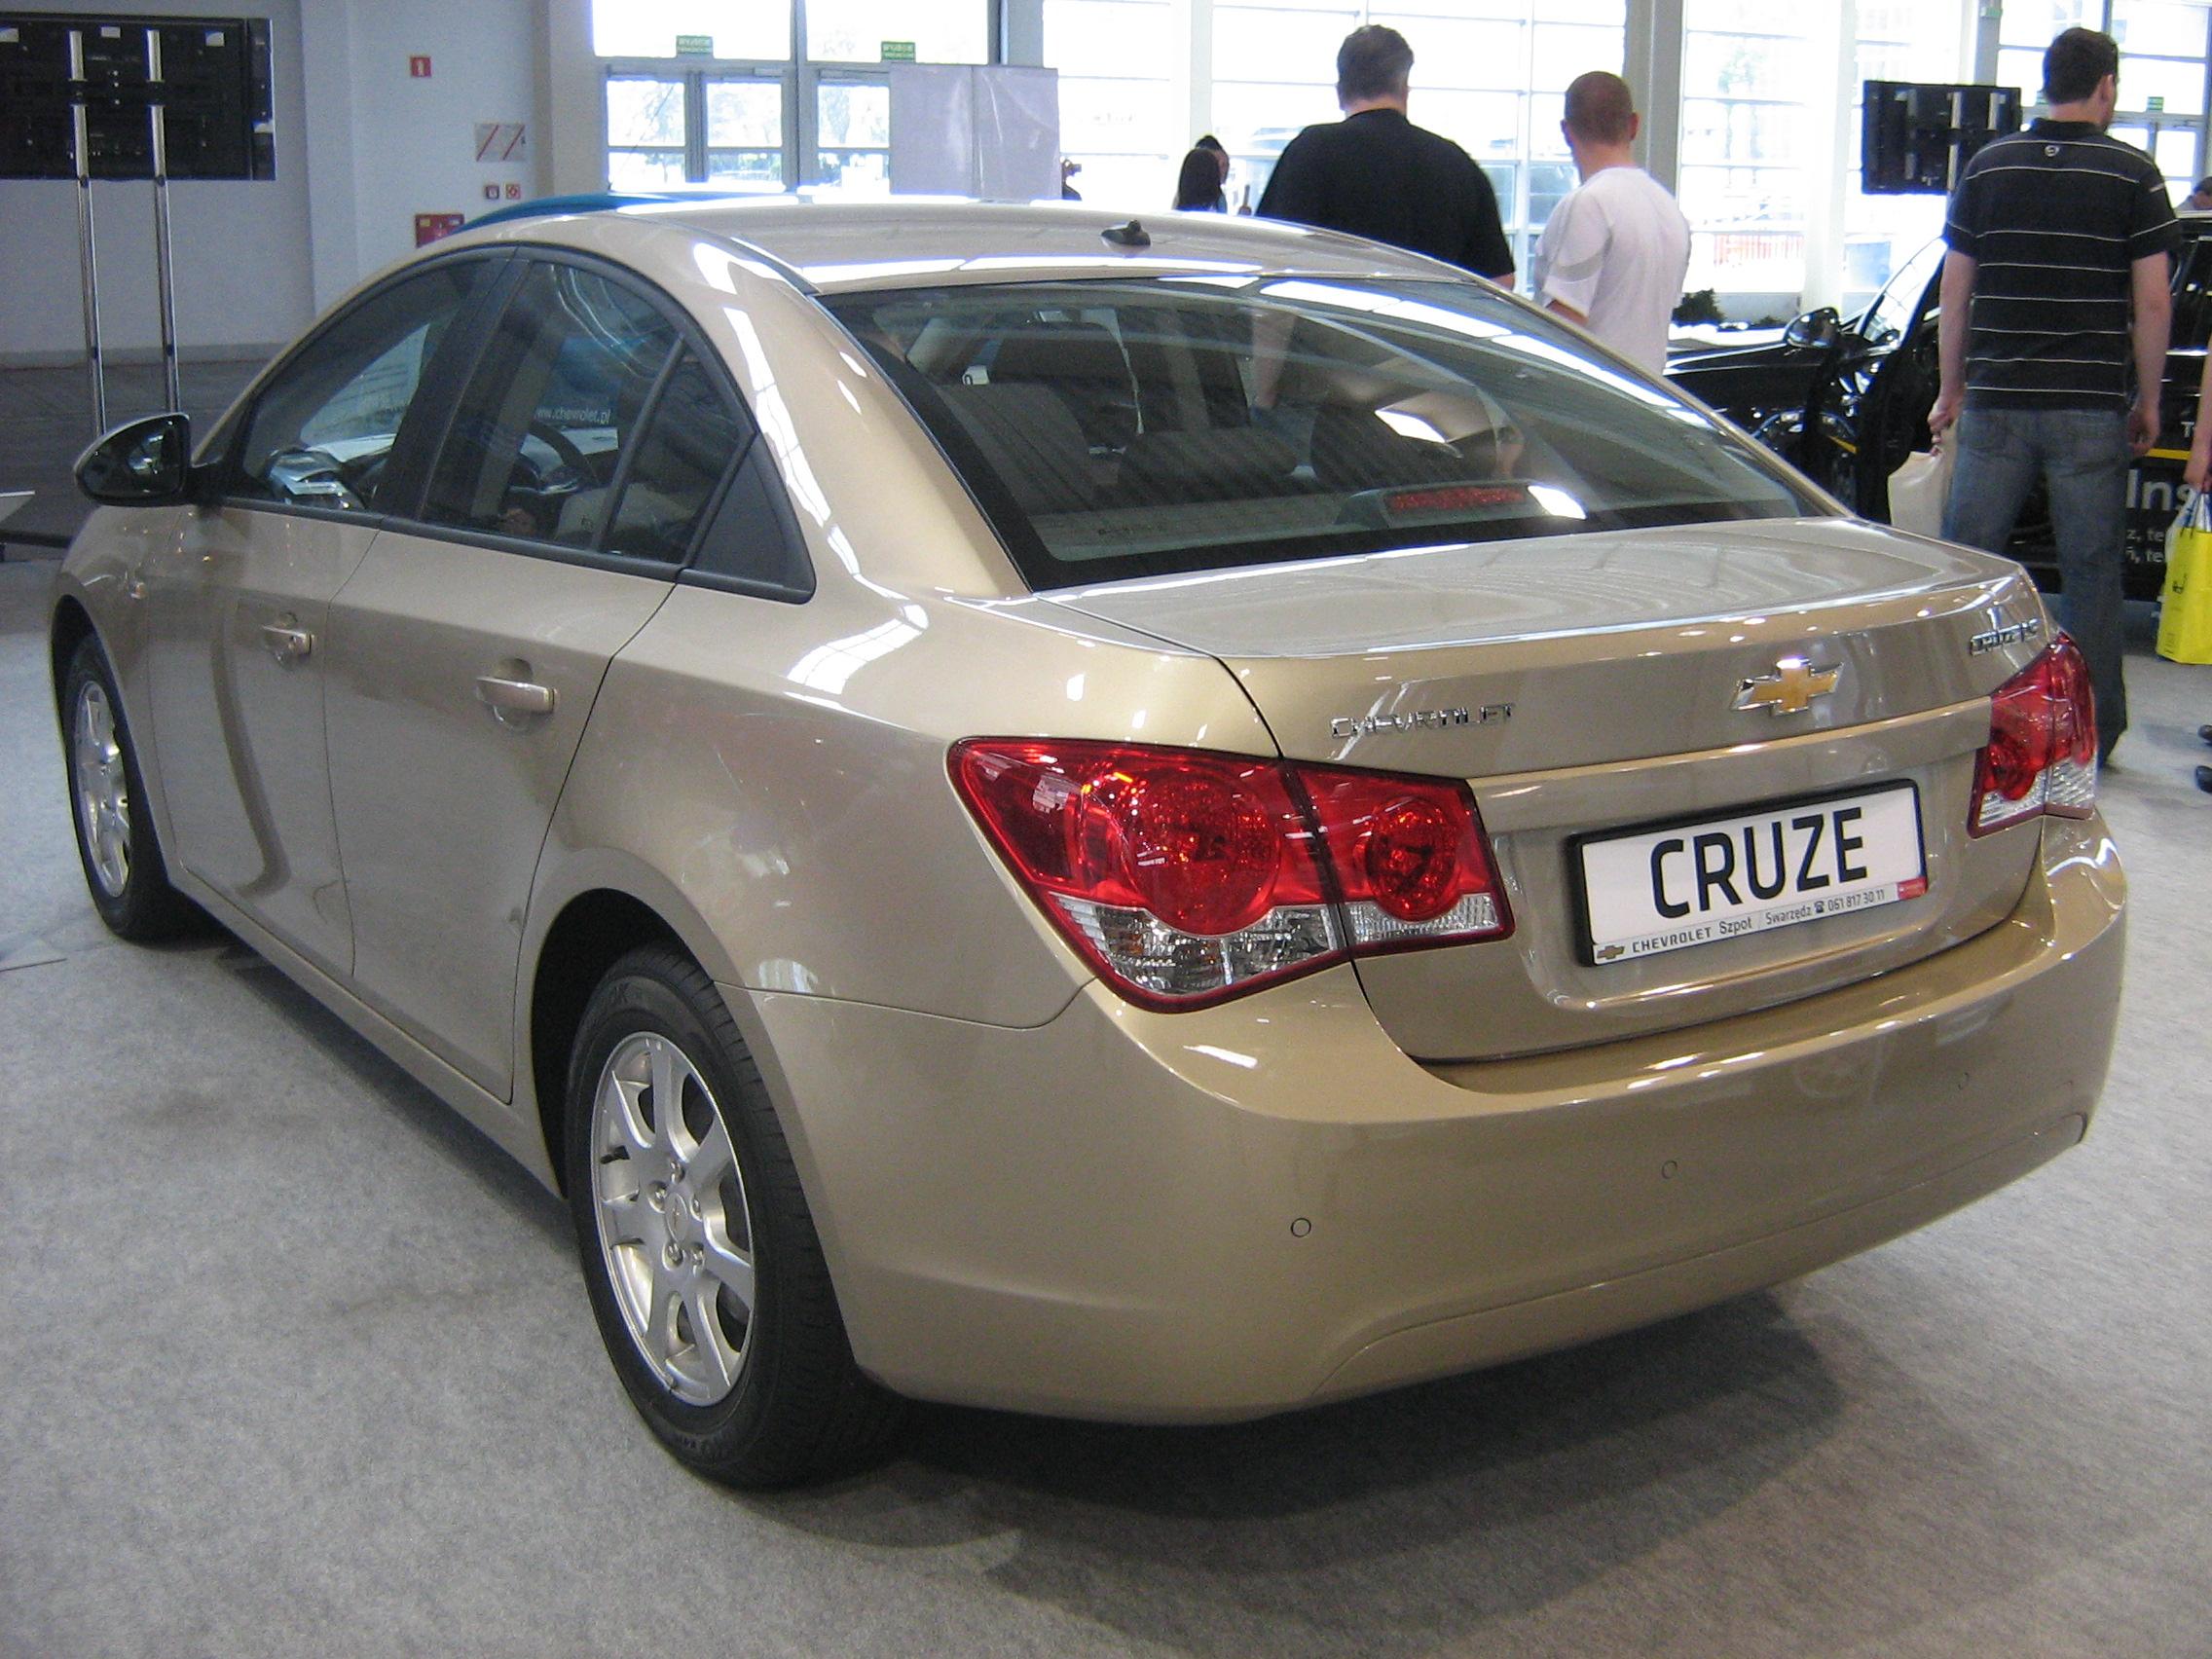 Kelebihan Chevrolet Cruze 2009 Top Model Tahun Ini